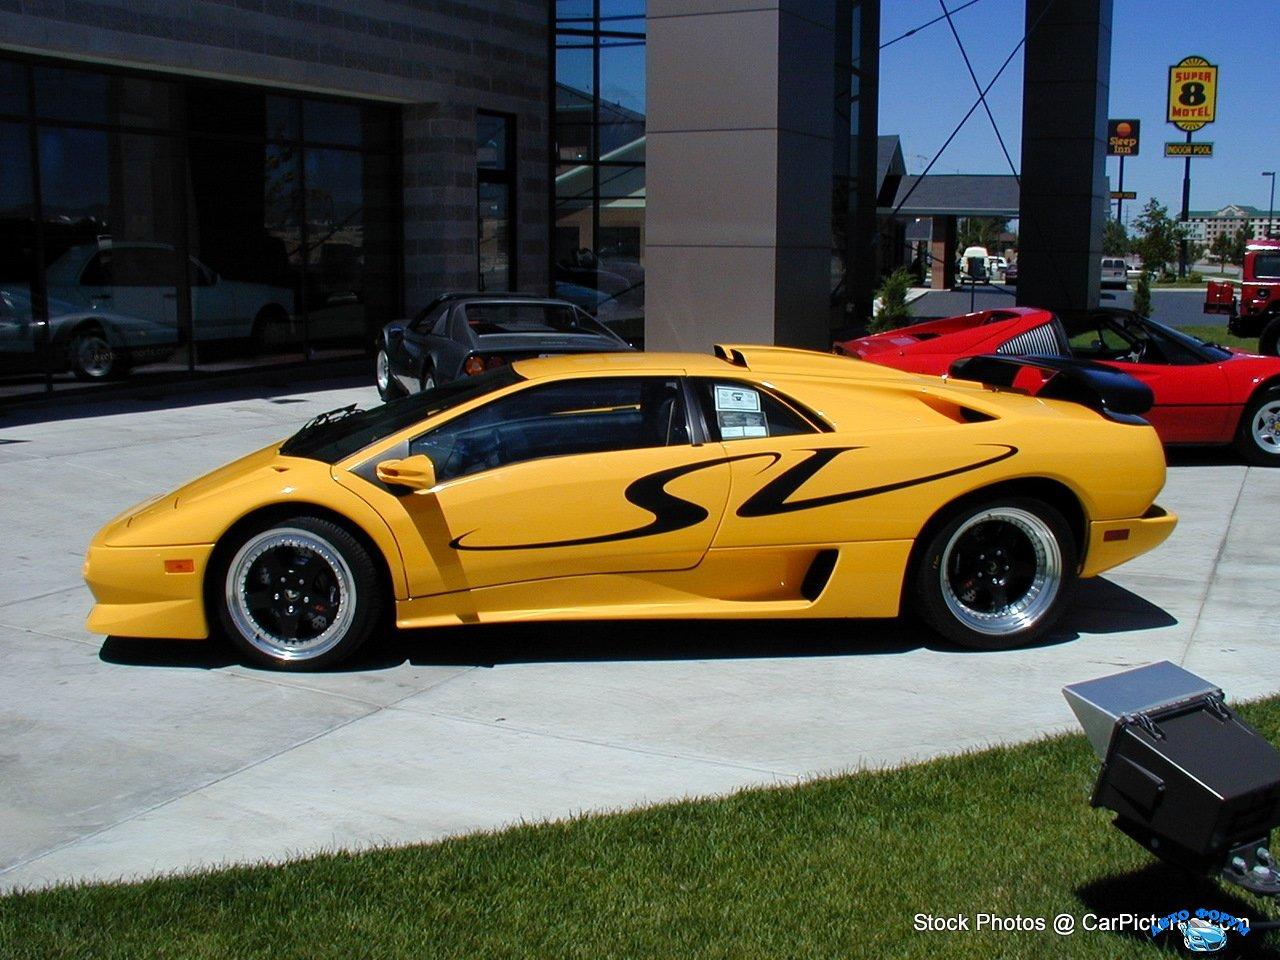 Lamborghini-Diablo-SV-yellow-1998-10AI8482727153AA.jpeg